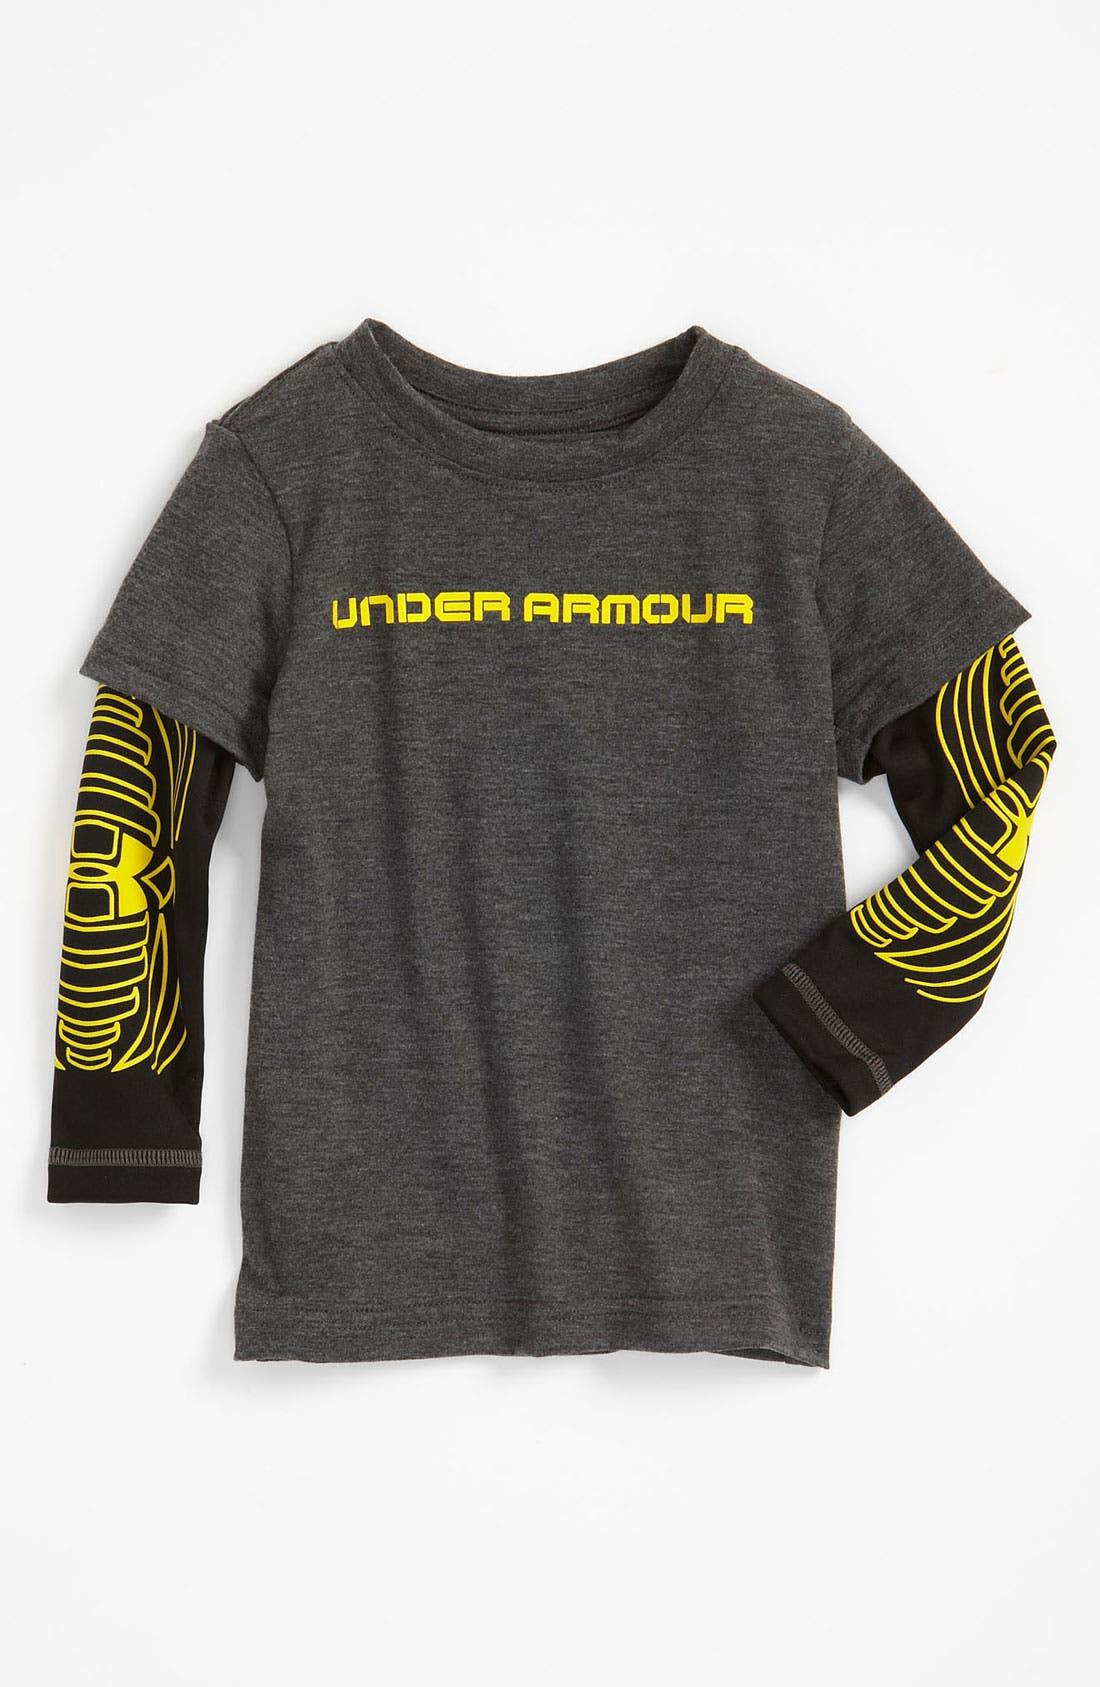 Alternate Image 1 Selected - Under Armour 'Slider' T-Shirt (Toddler)